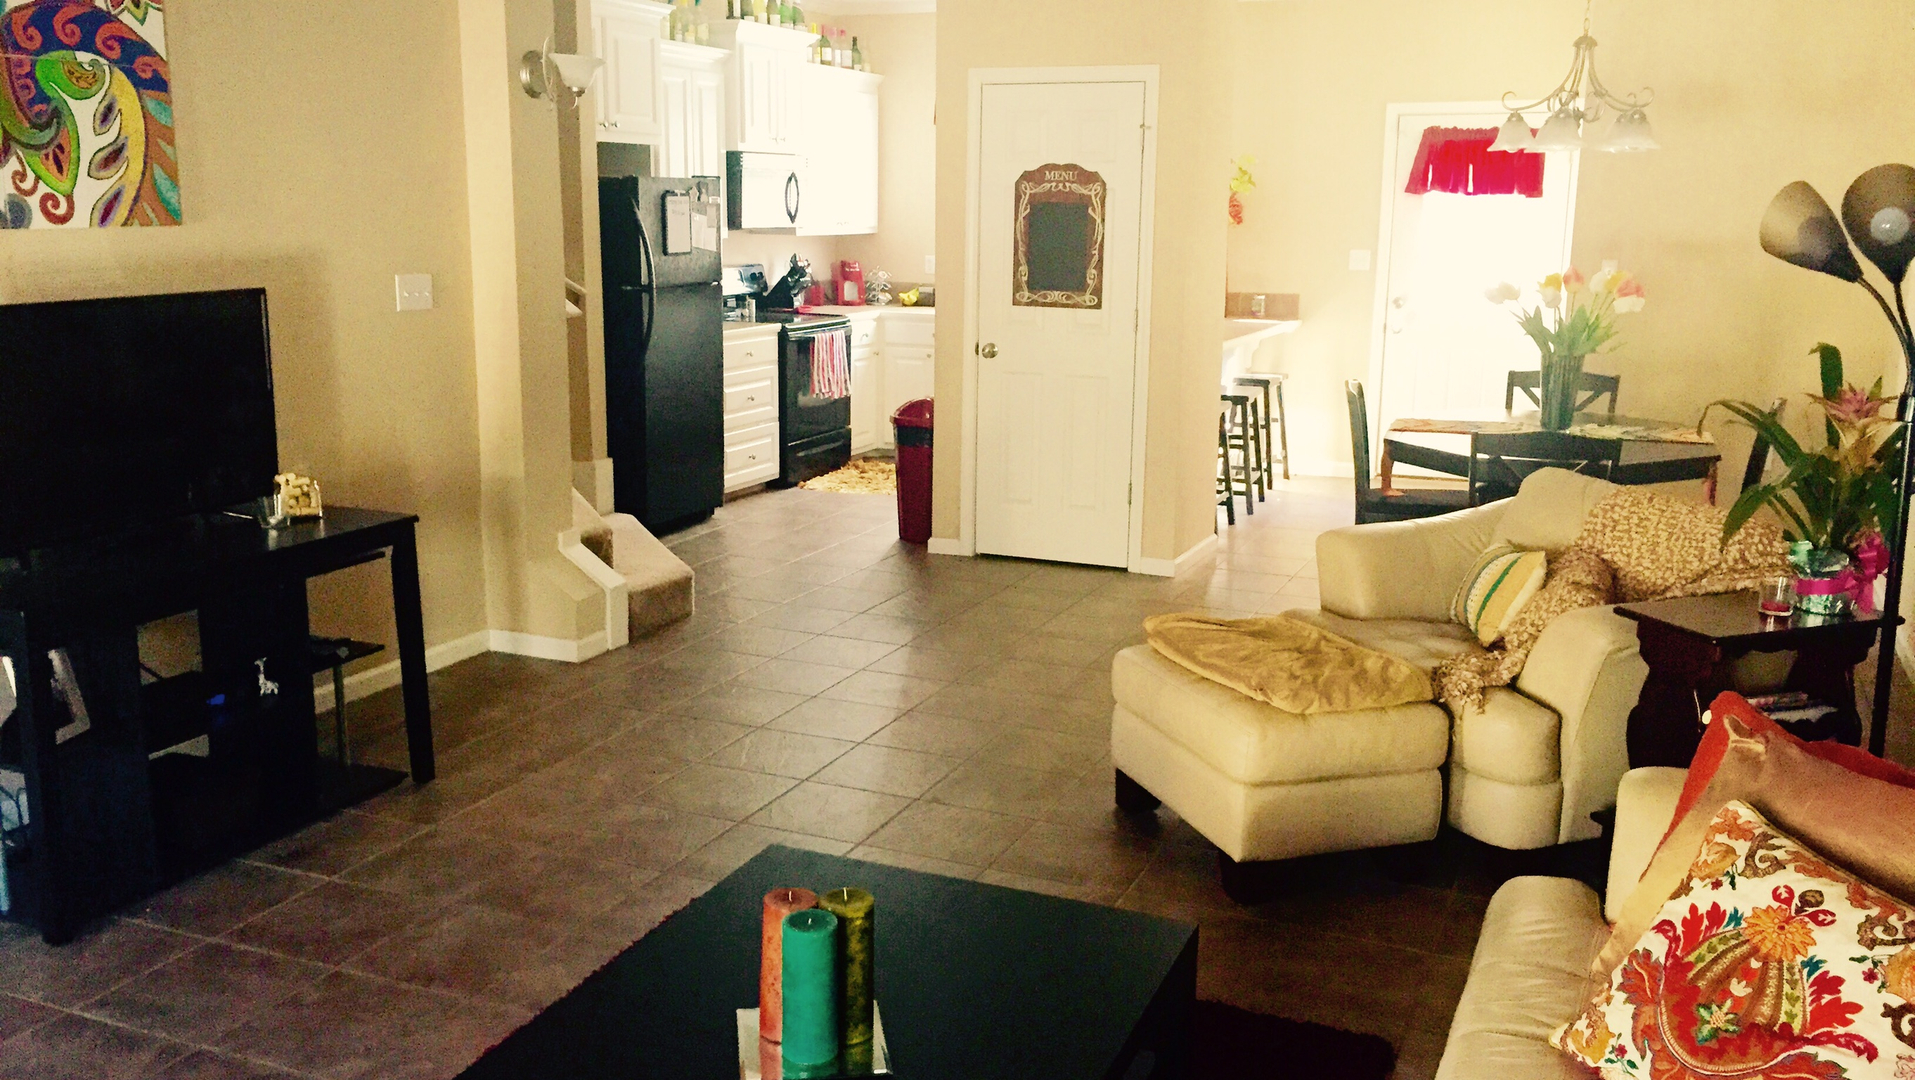 me rouge net apartment apartments in pictures bedroom for ideas surripui four plans house baton near terrific